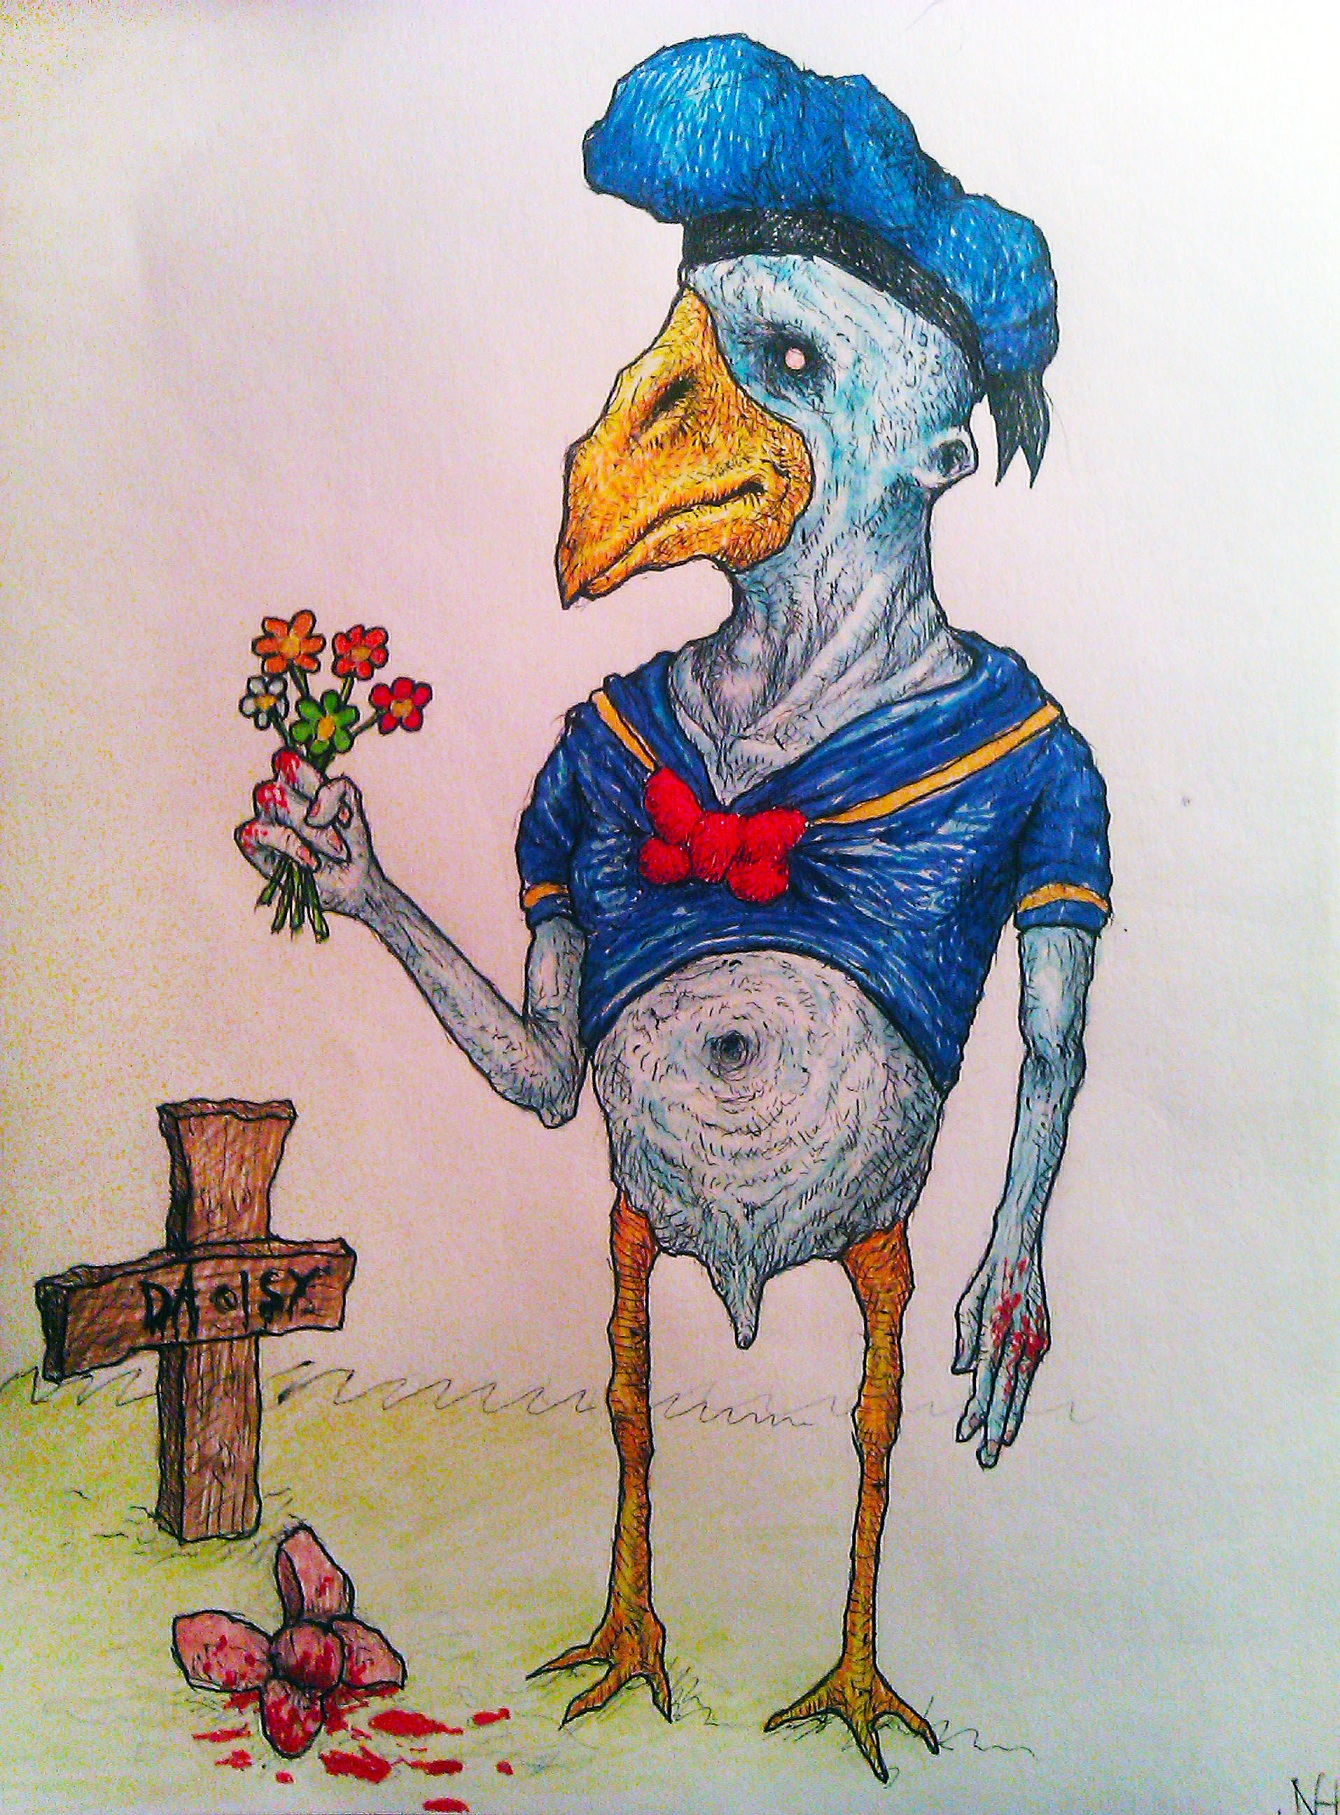 Donald FUCK